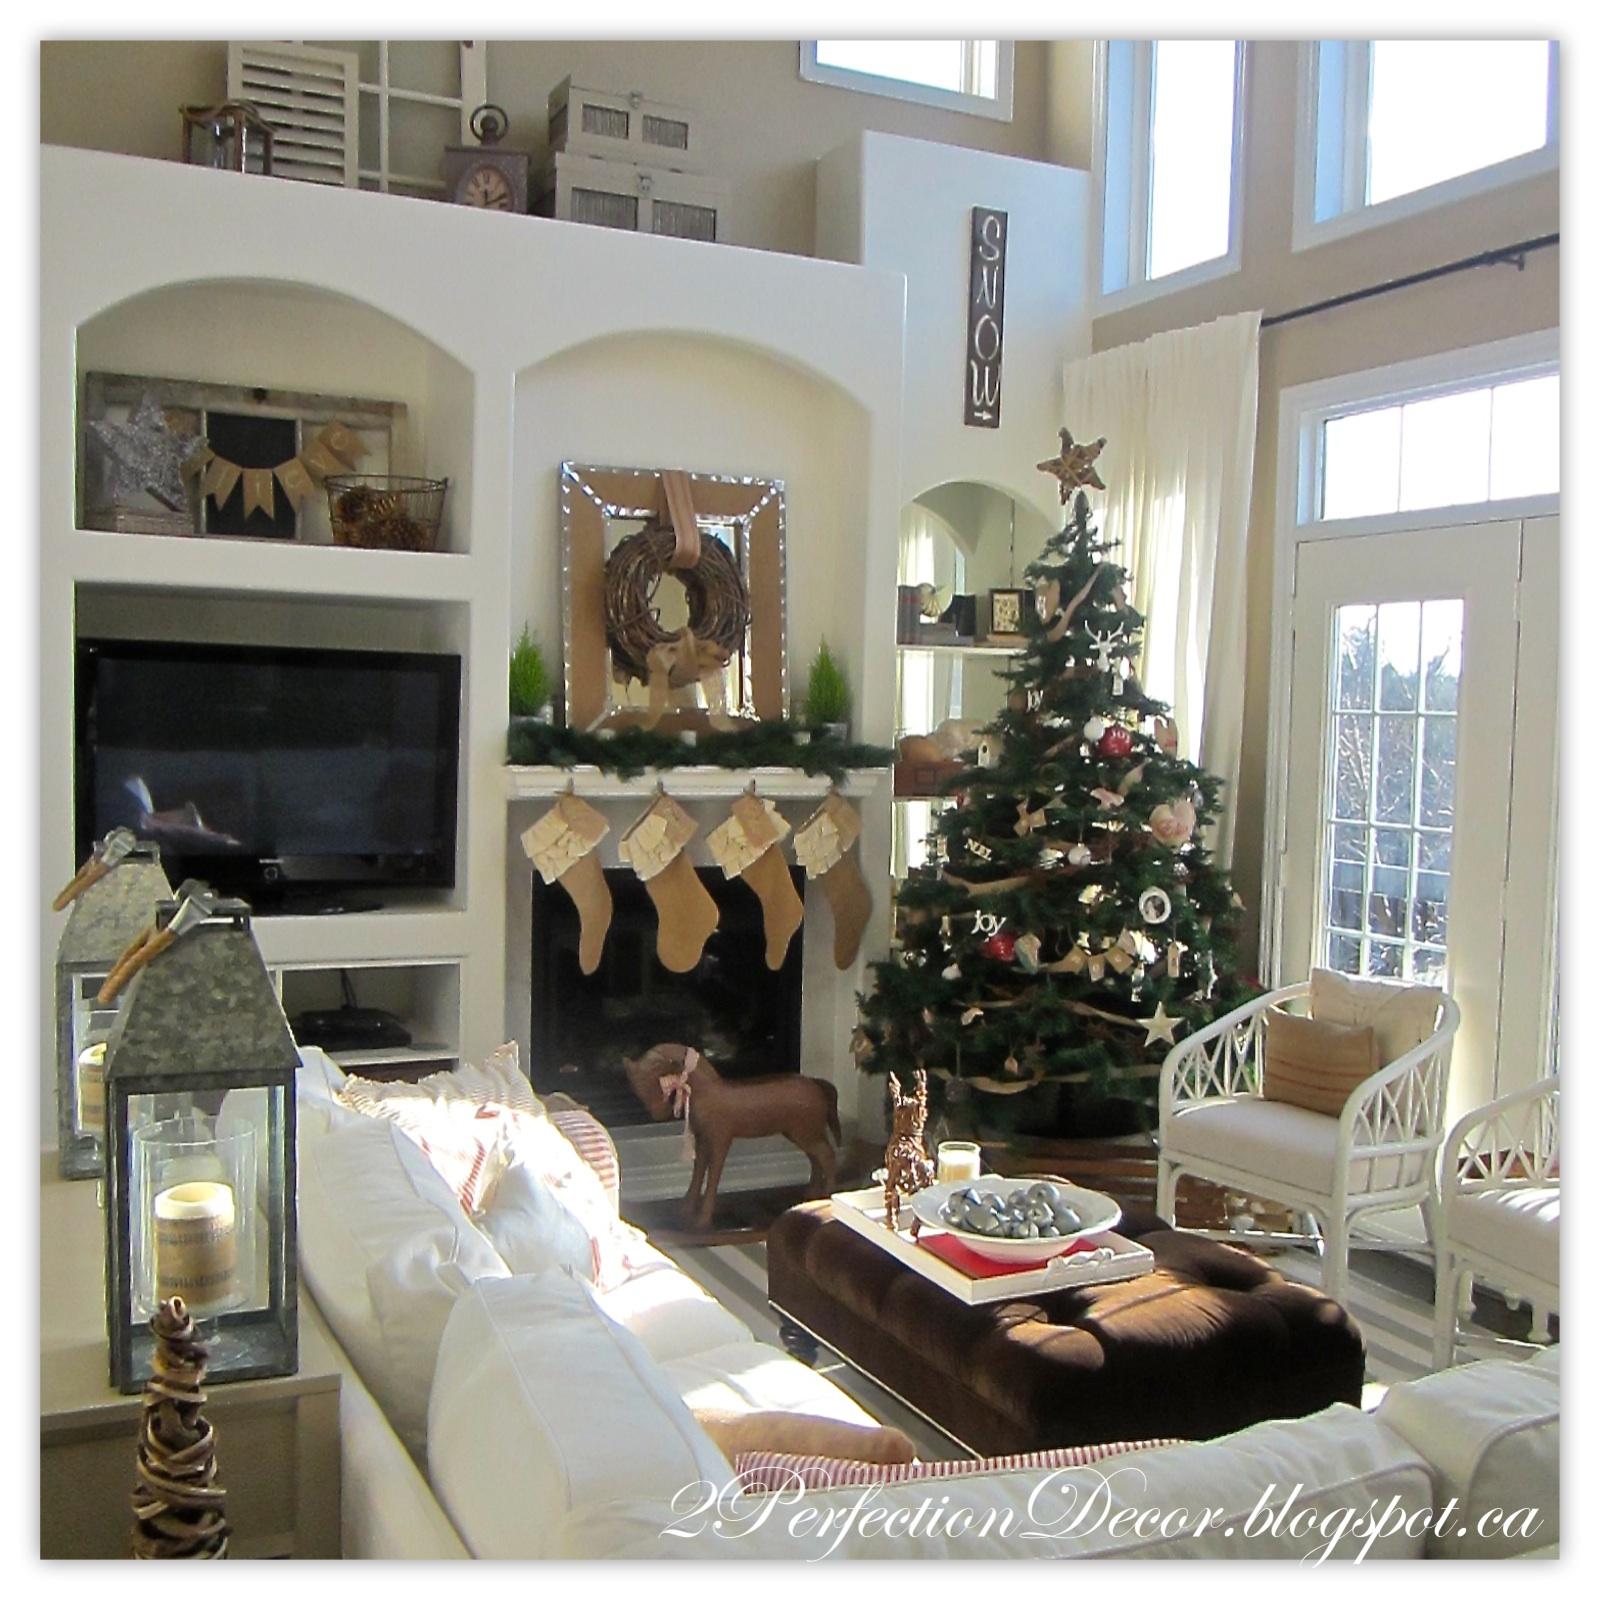 2perfection Decor Christmas Home Tour 2015